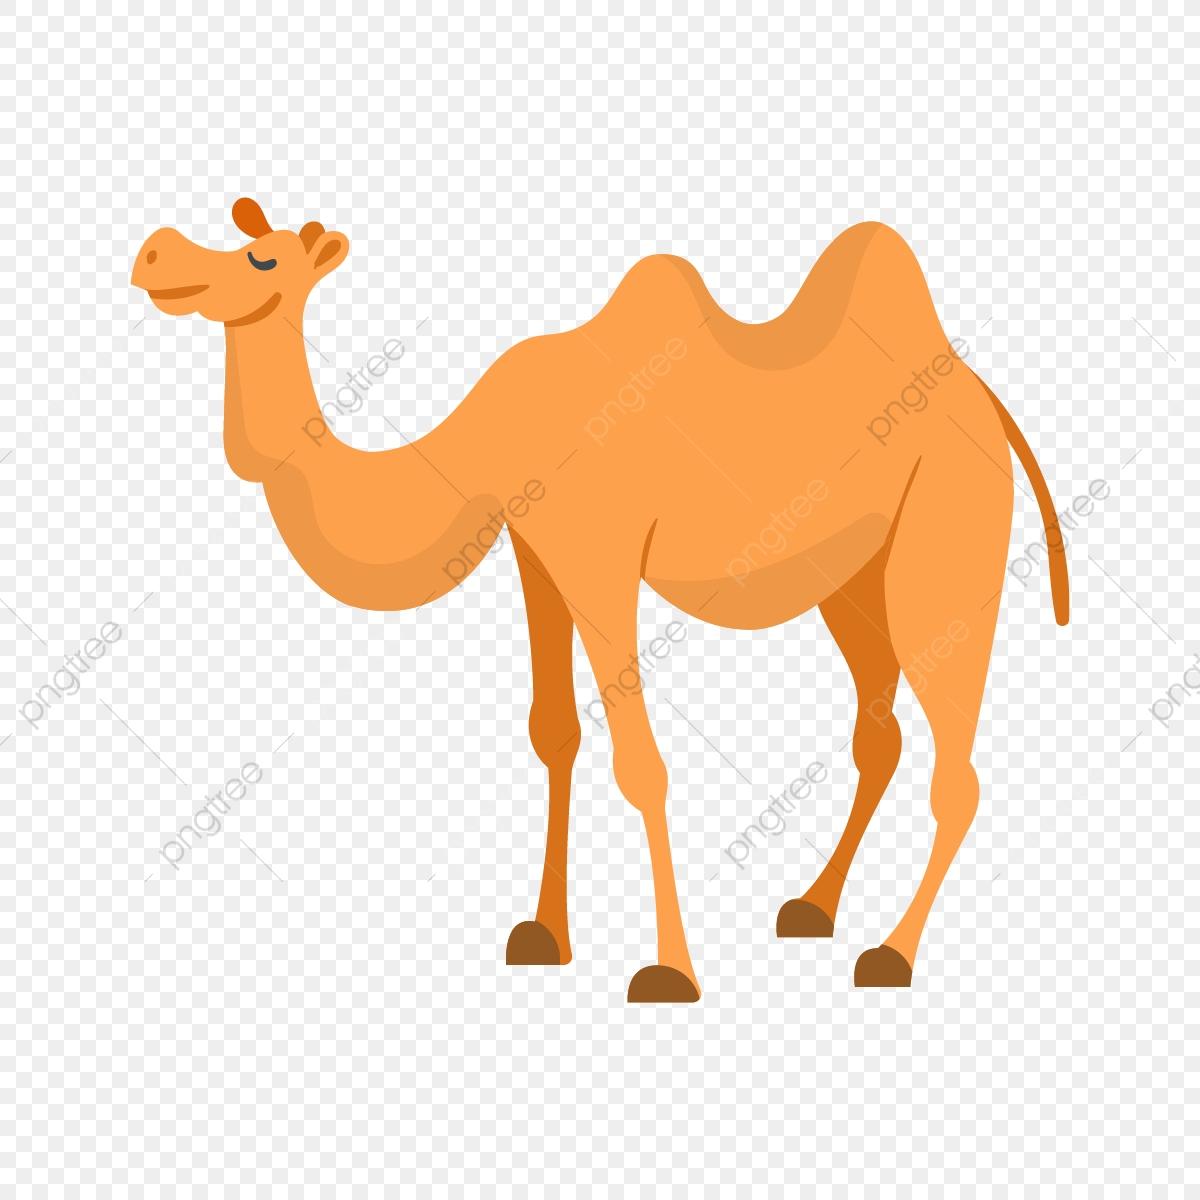 Cartoon isolated journey illustration. Camel clipart transparent background